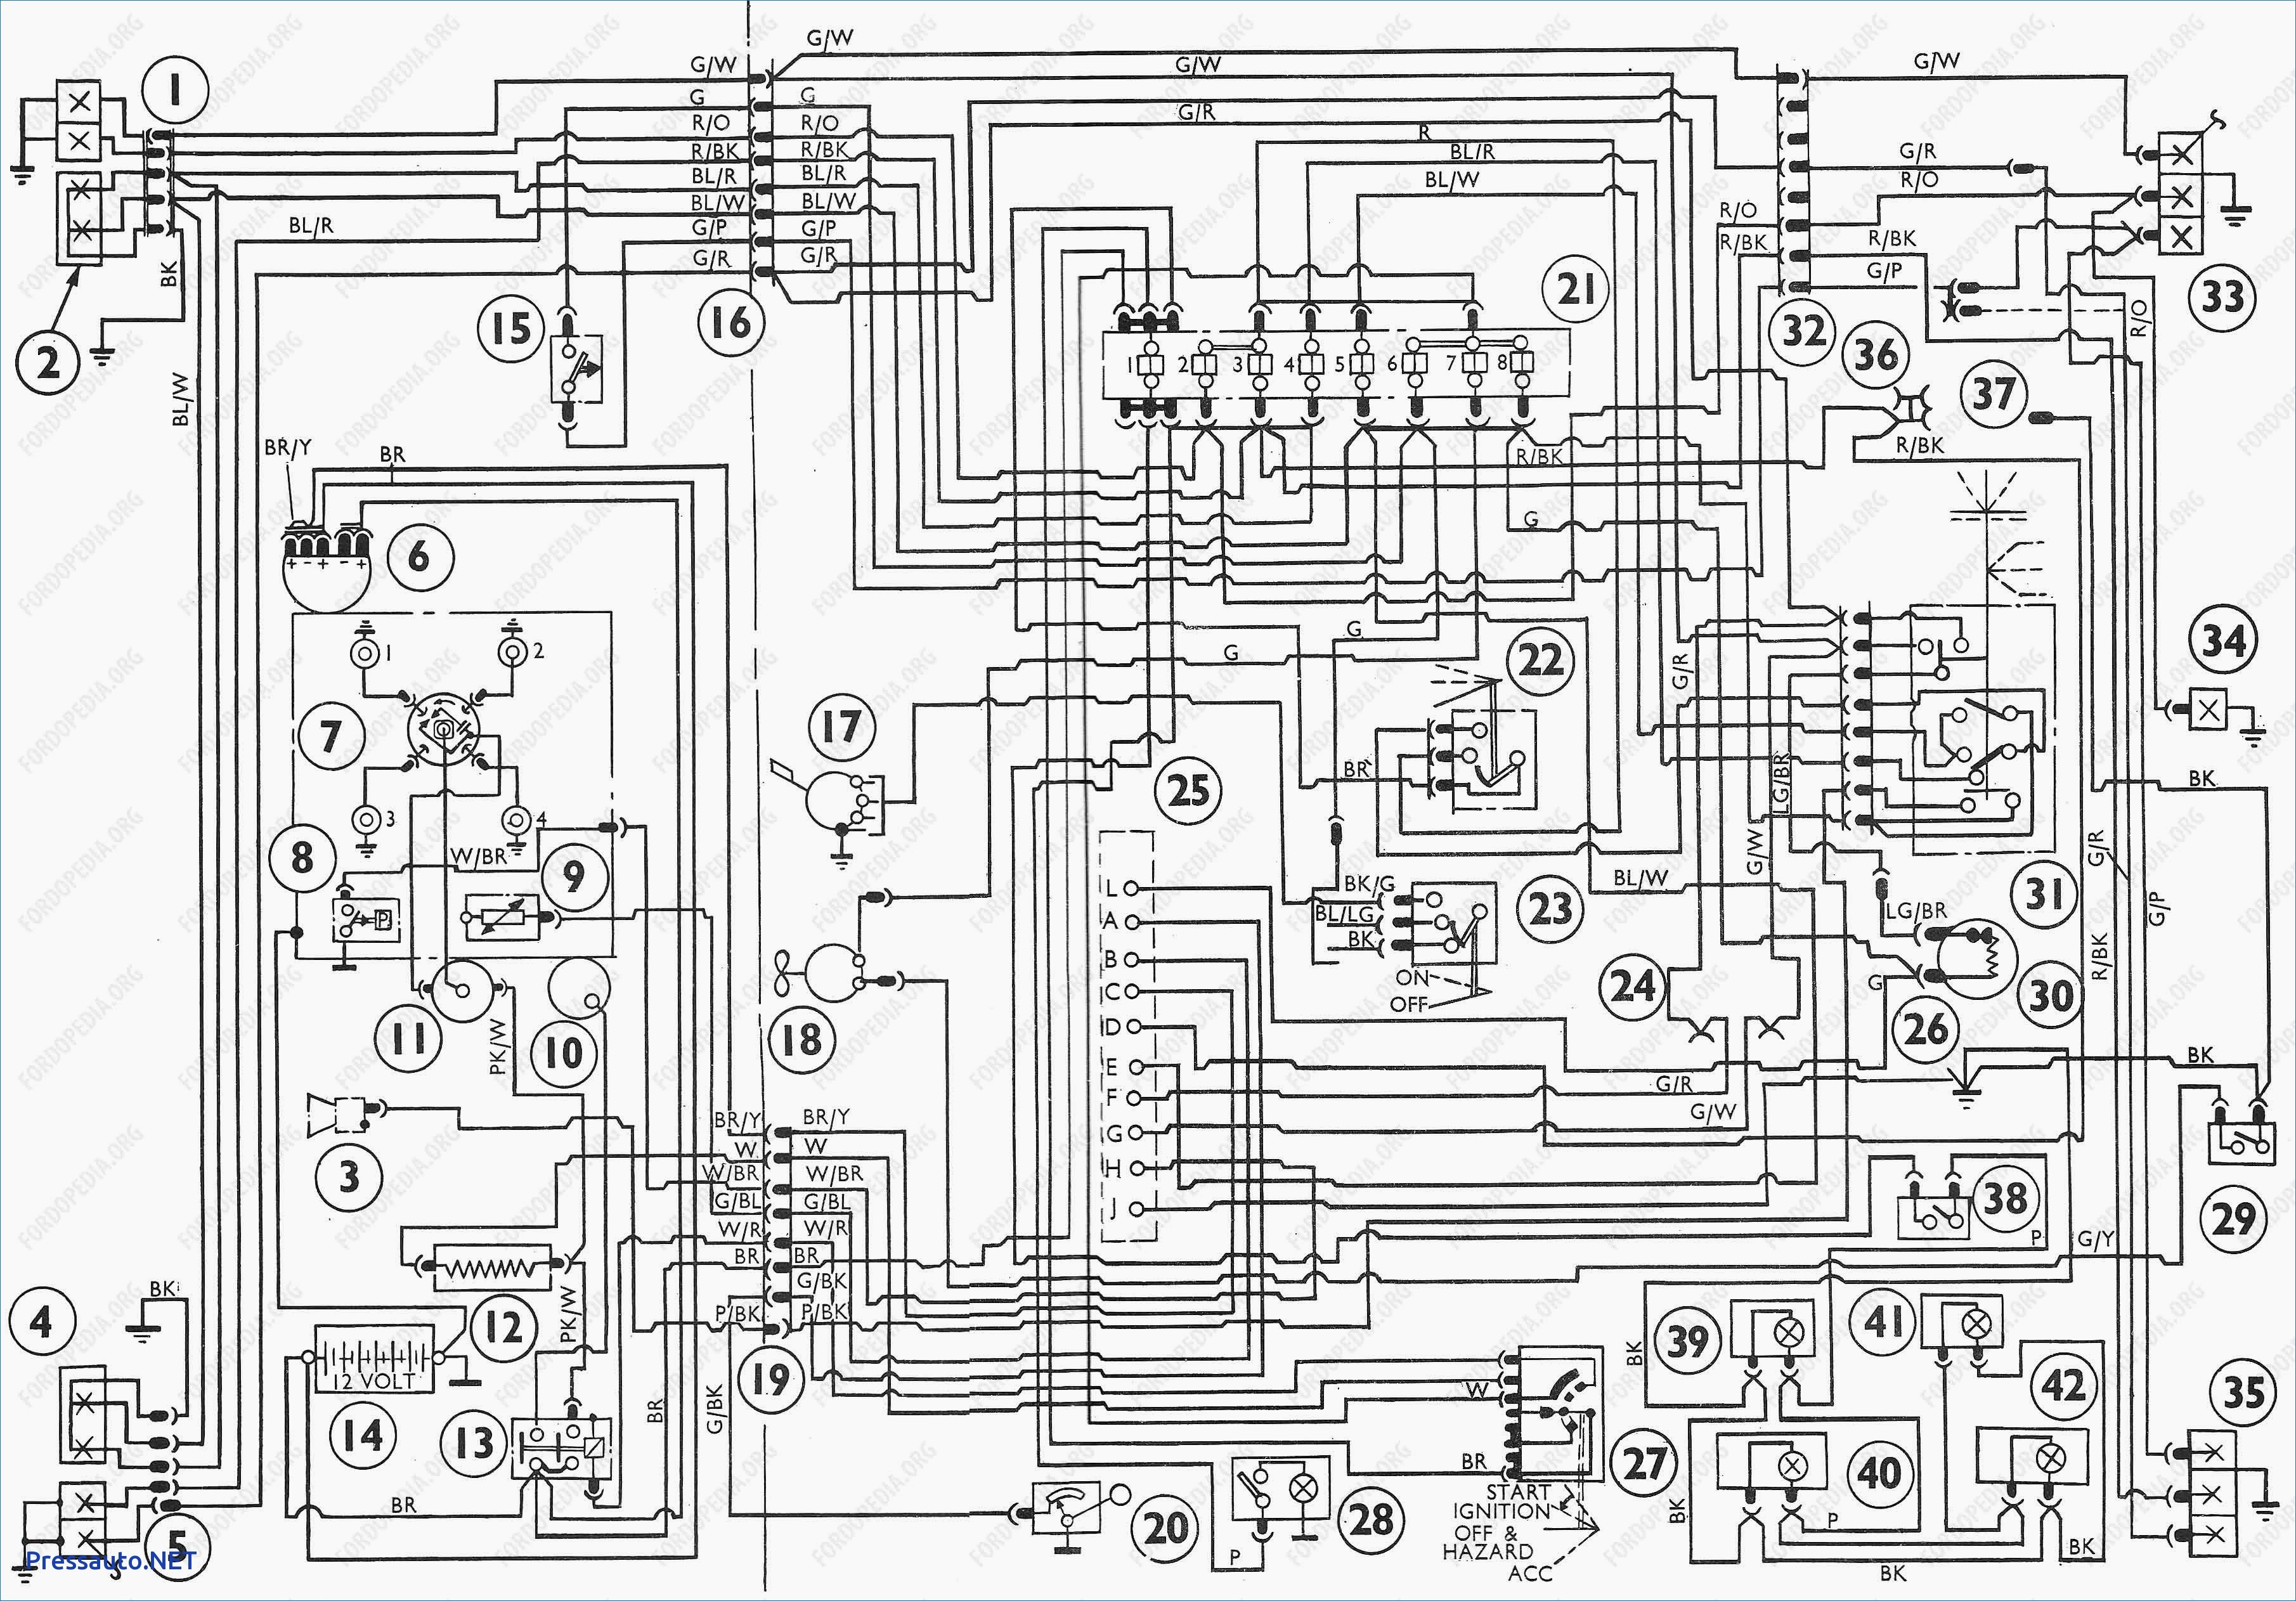 [SCHEMATICS_48IS]  GR_8940] 1999 Ford Festiva Fuse Box Free Diagram | Ford Puma Wiring Diagram |  | Emba Lave Astic Flui Ginia Mohammedshrine Librar Wiring 101